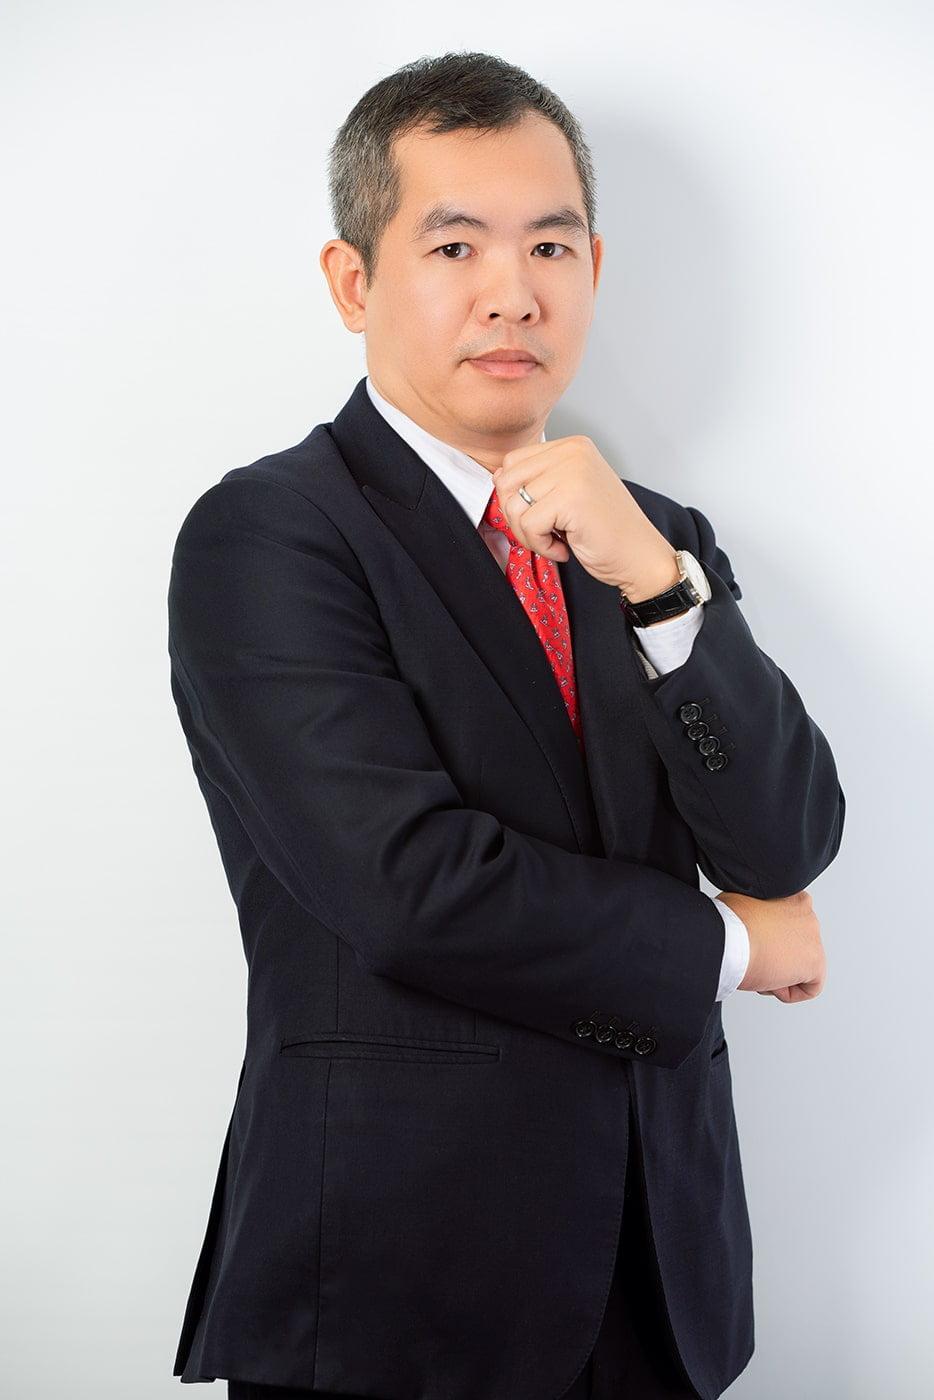 Profile cong ty 11 - Album chụp ảnh profile công ty Luật Dzungsrt Law - HThao Studio